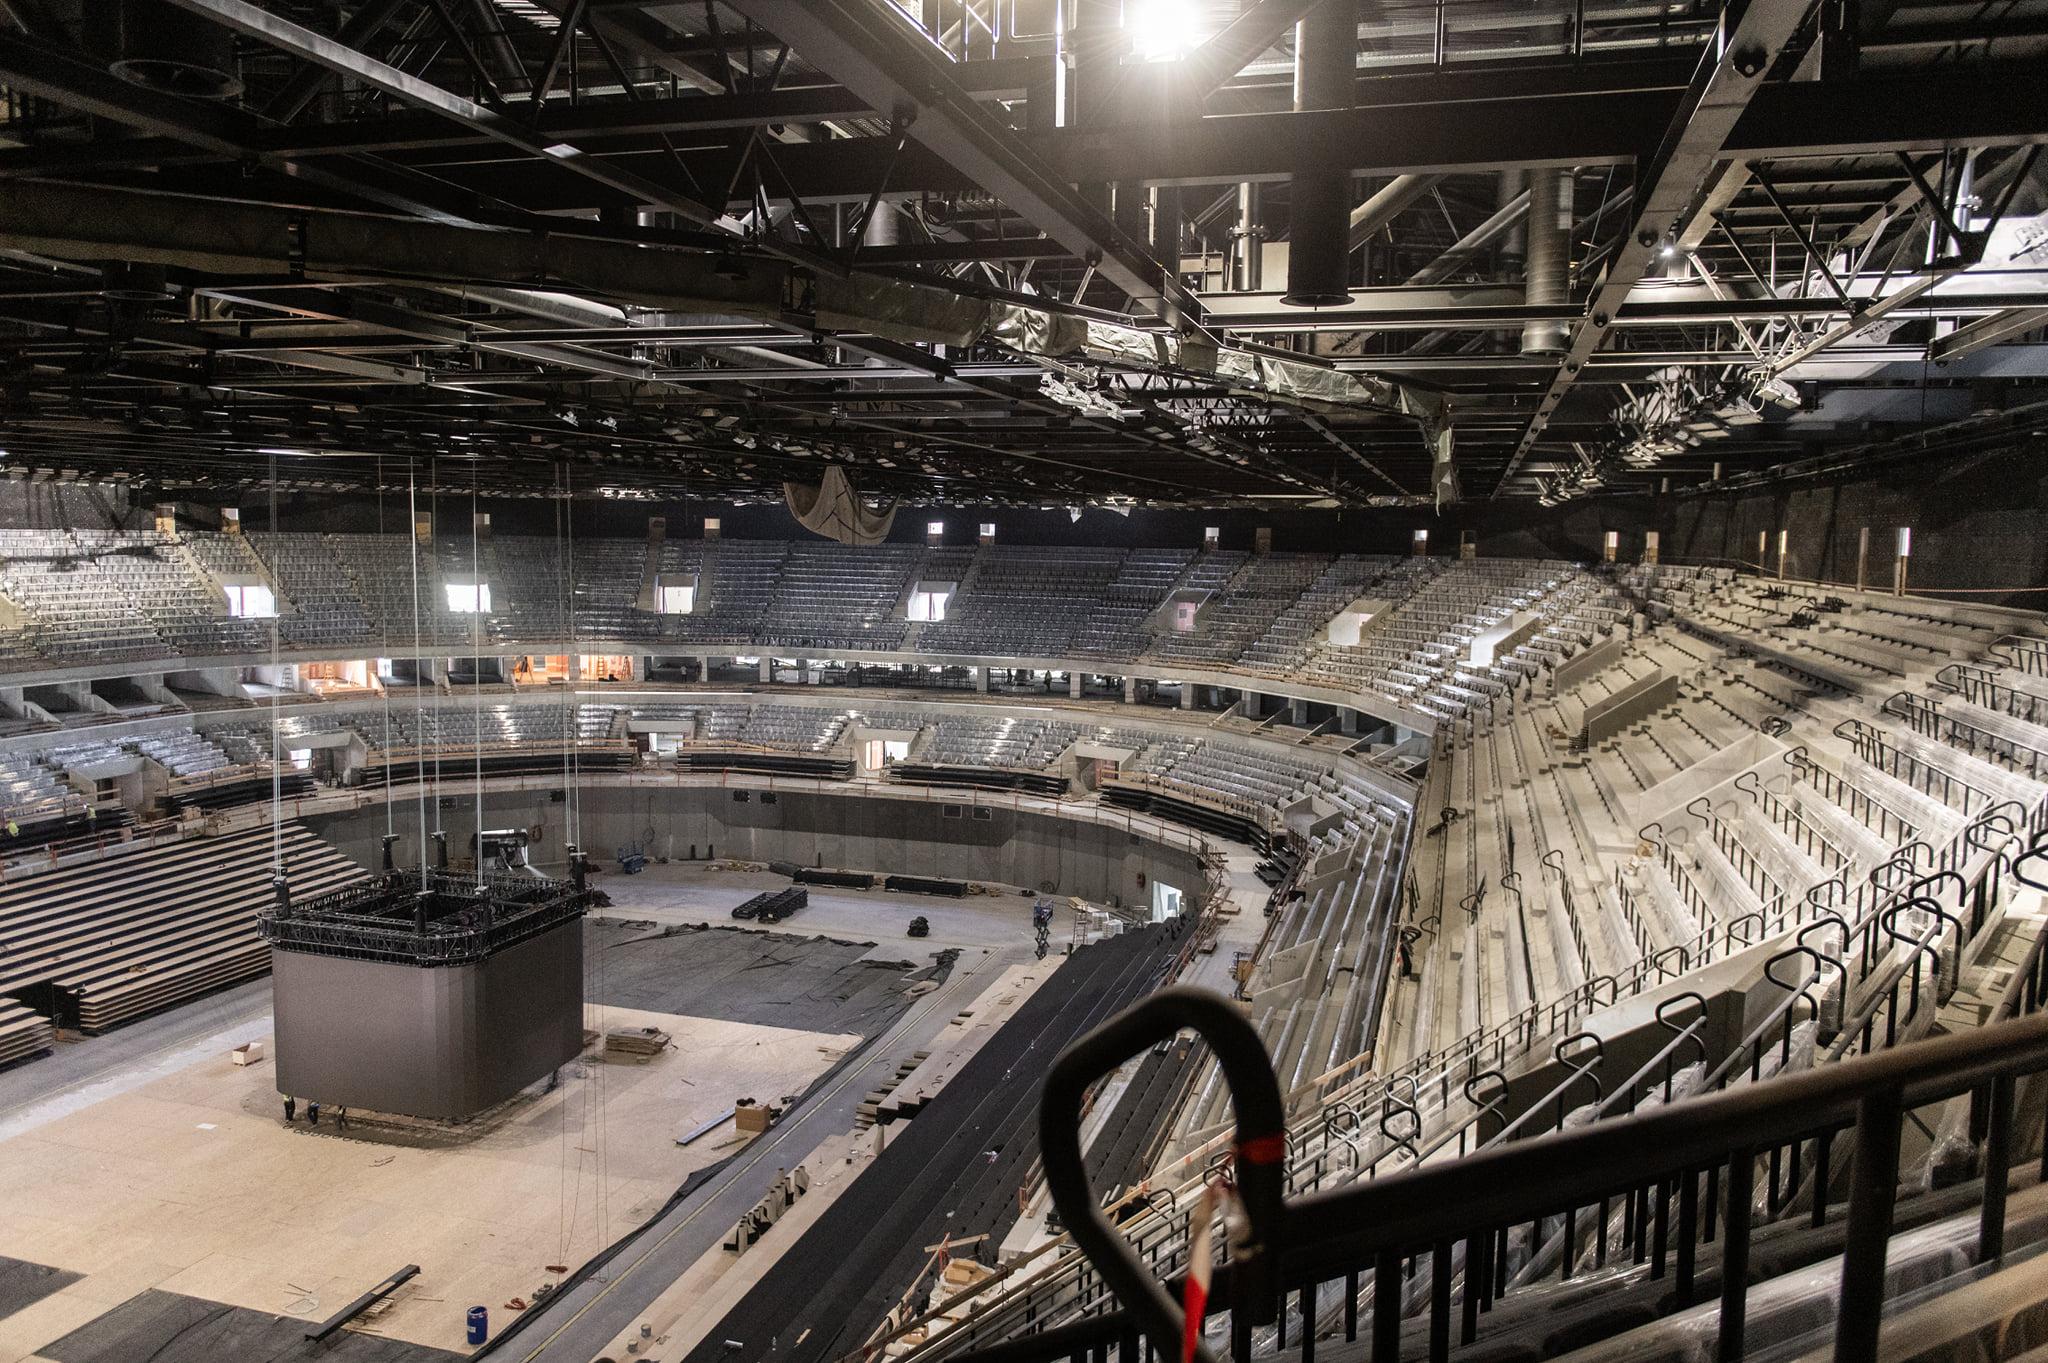 handball stadium budapest Interior building 4